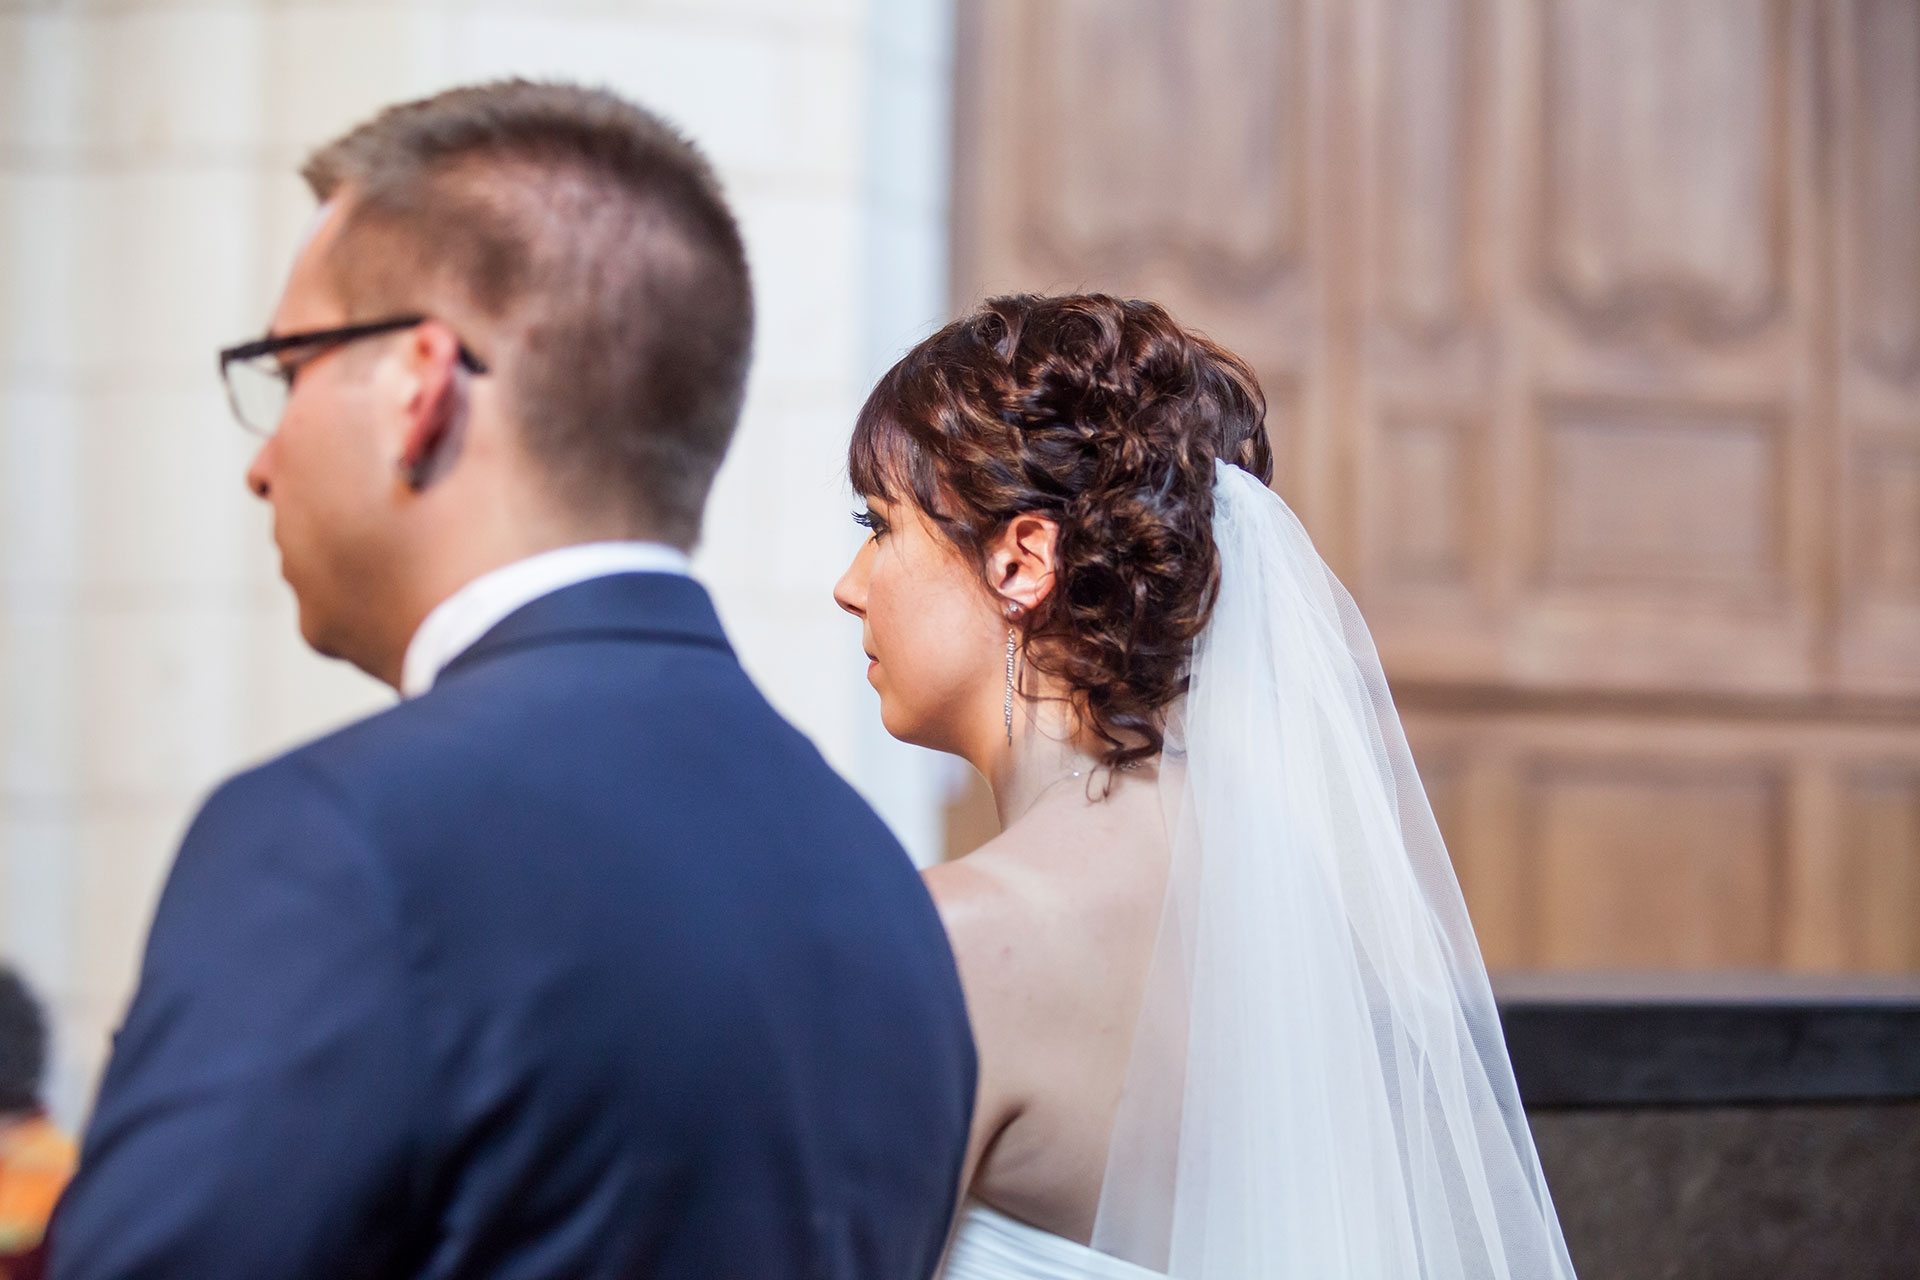 particuliers-evenements-mariages-oui-aurelie&geoffrey-11